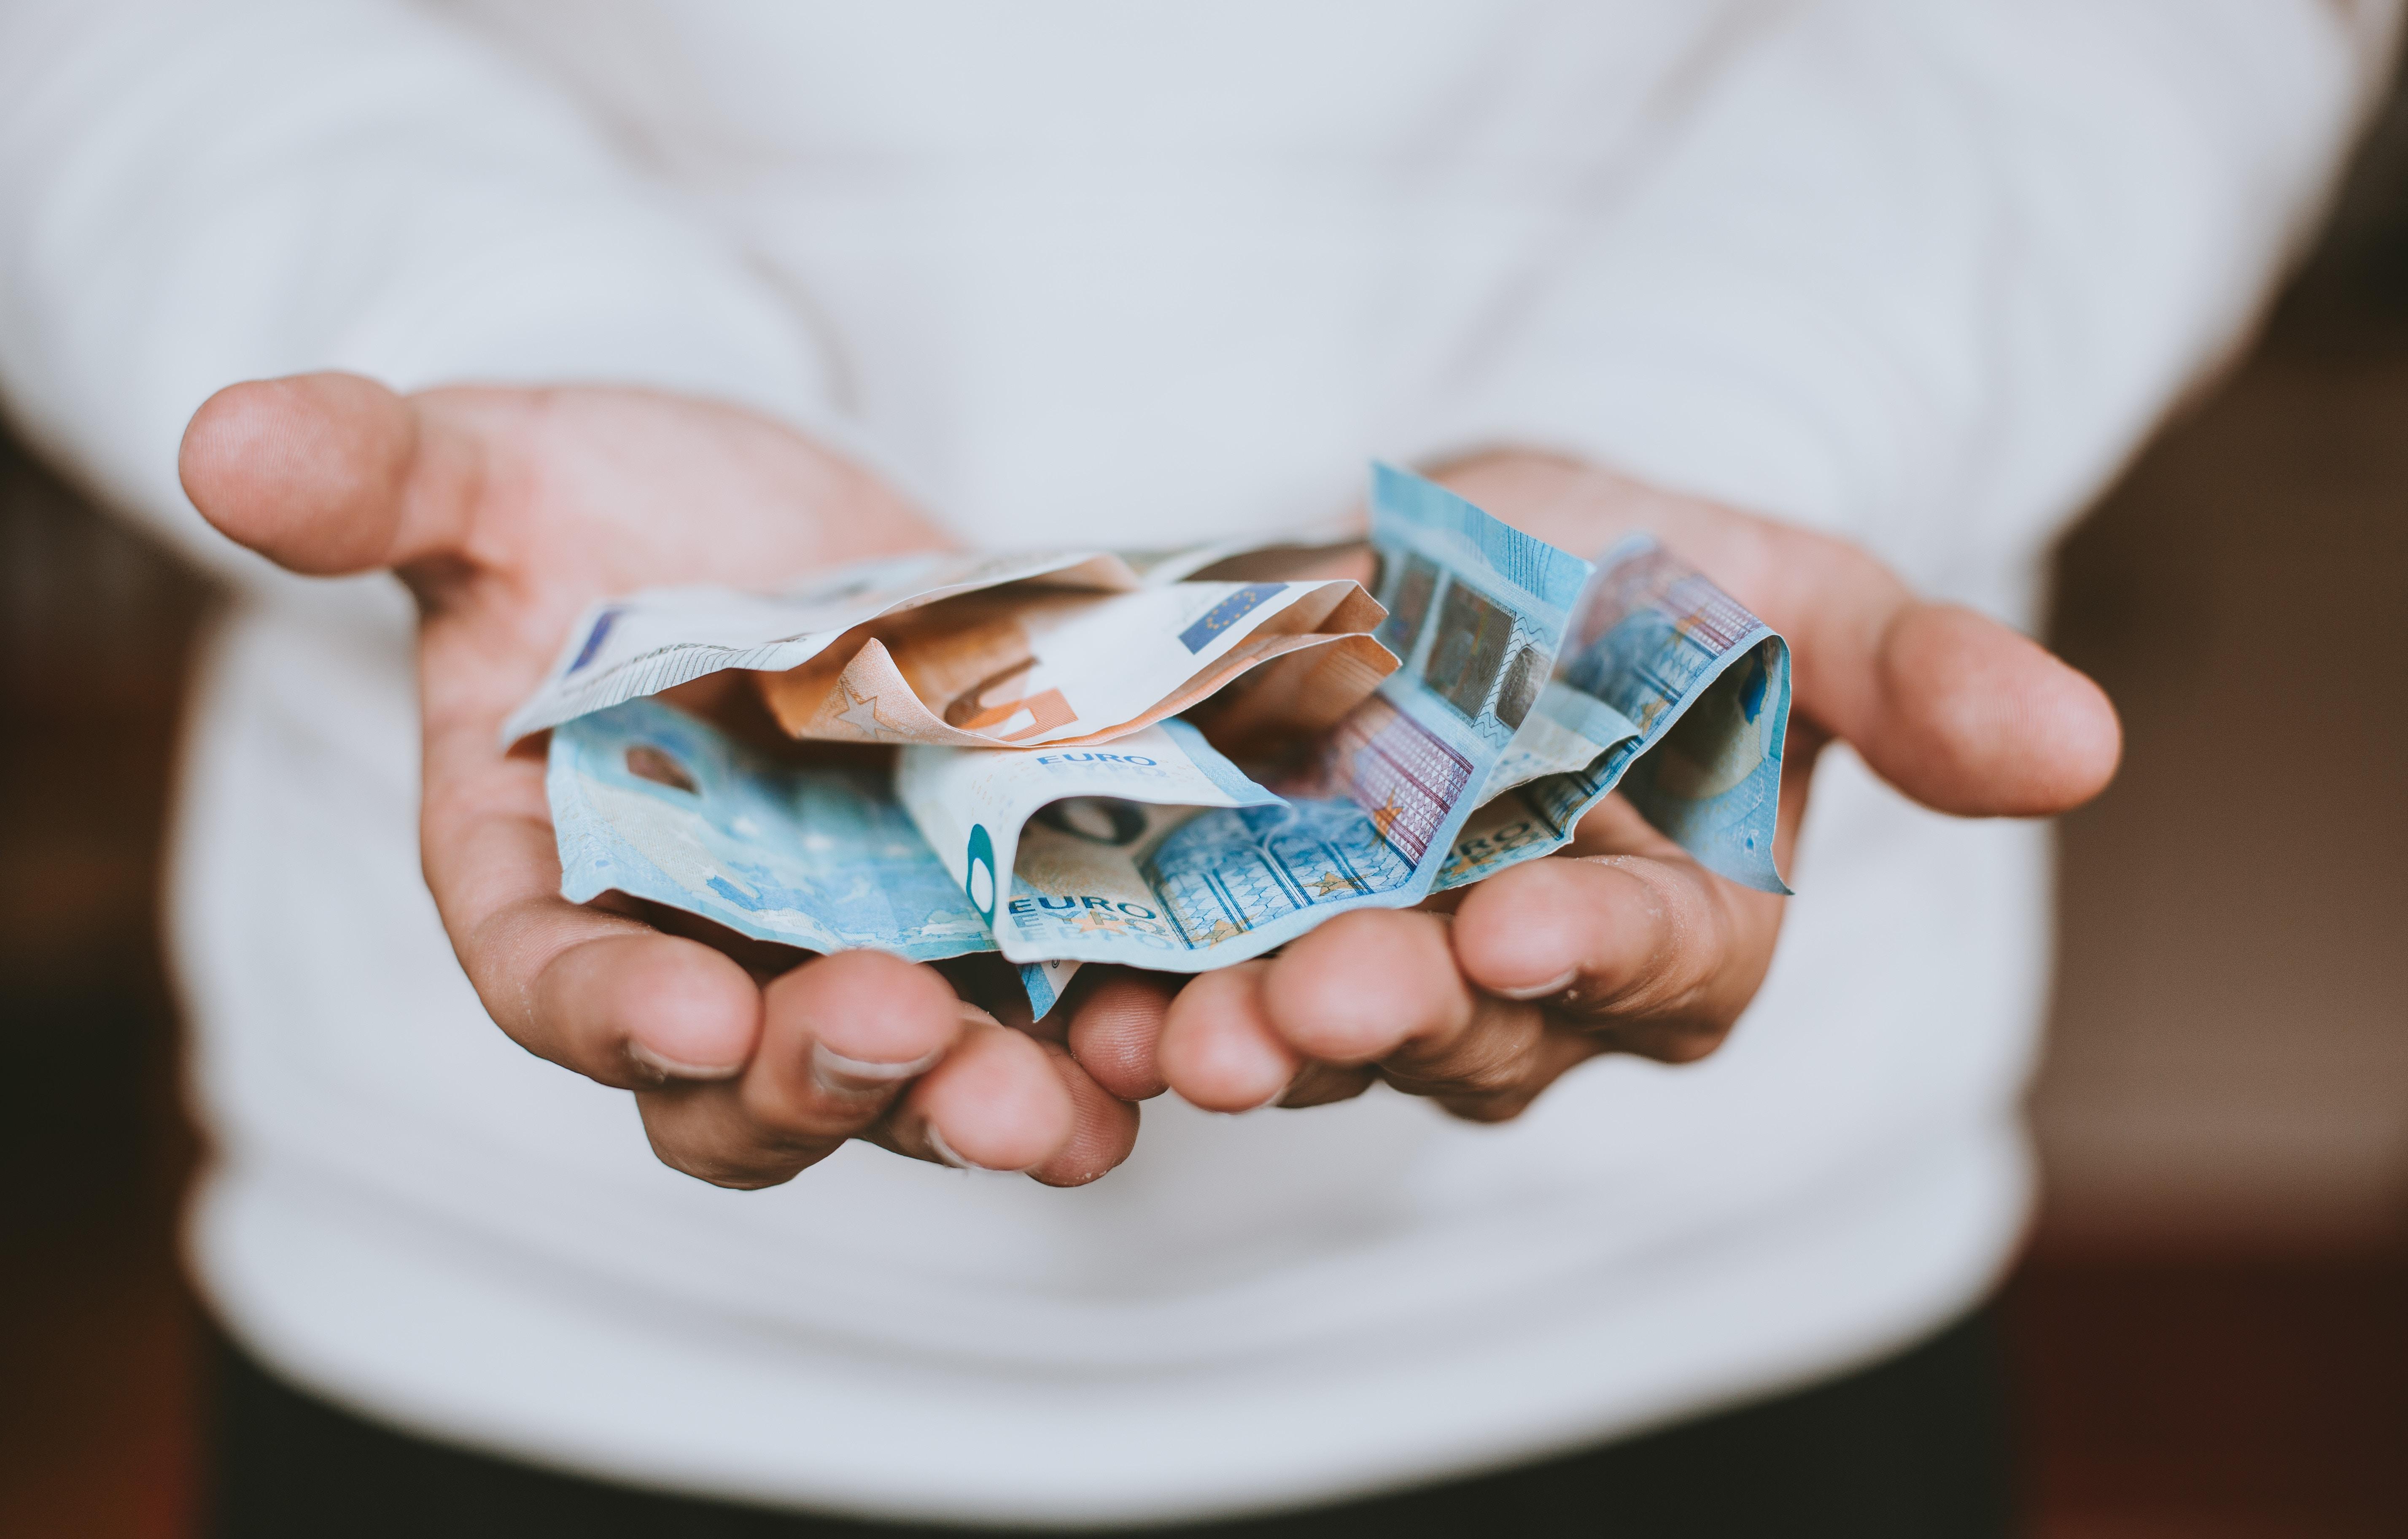 Photo of hands holding euro bills